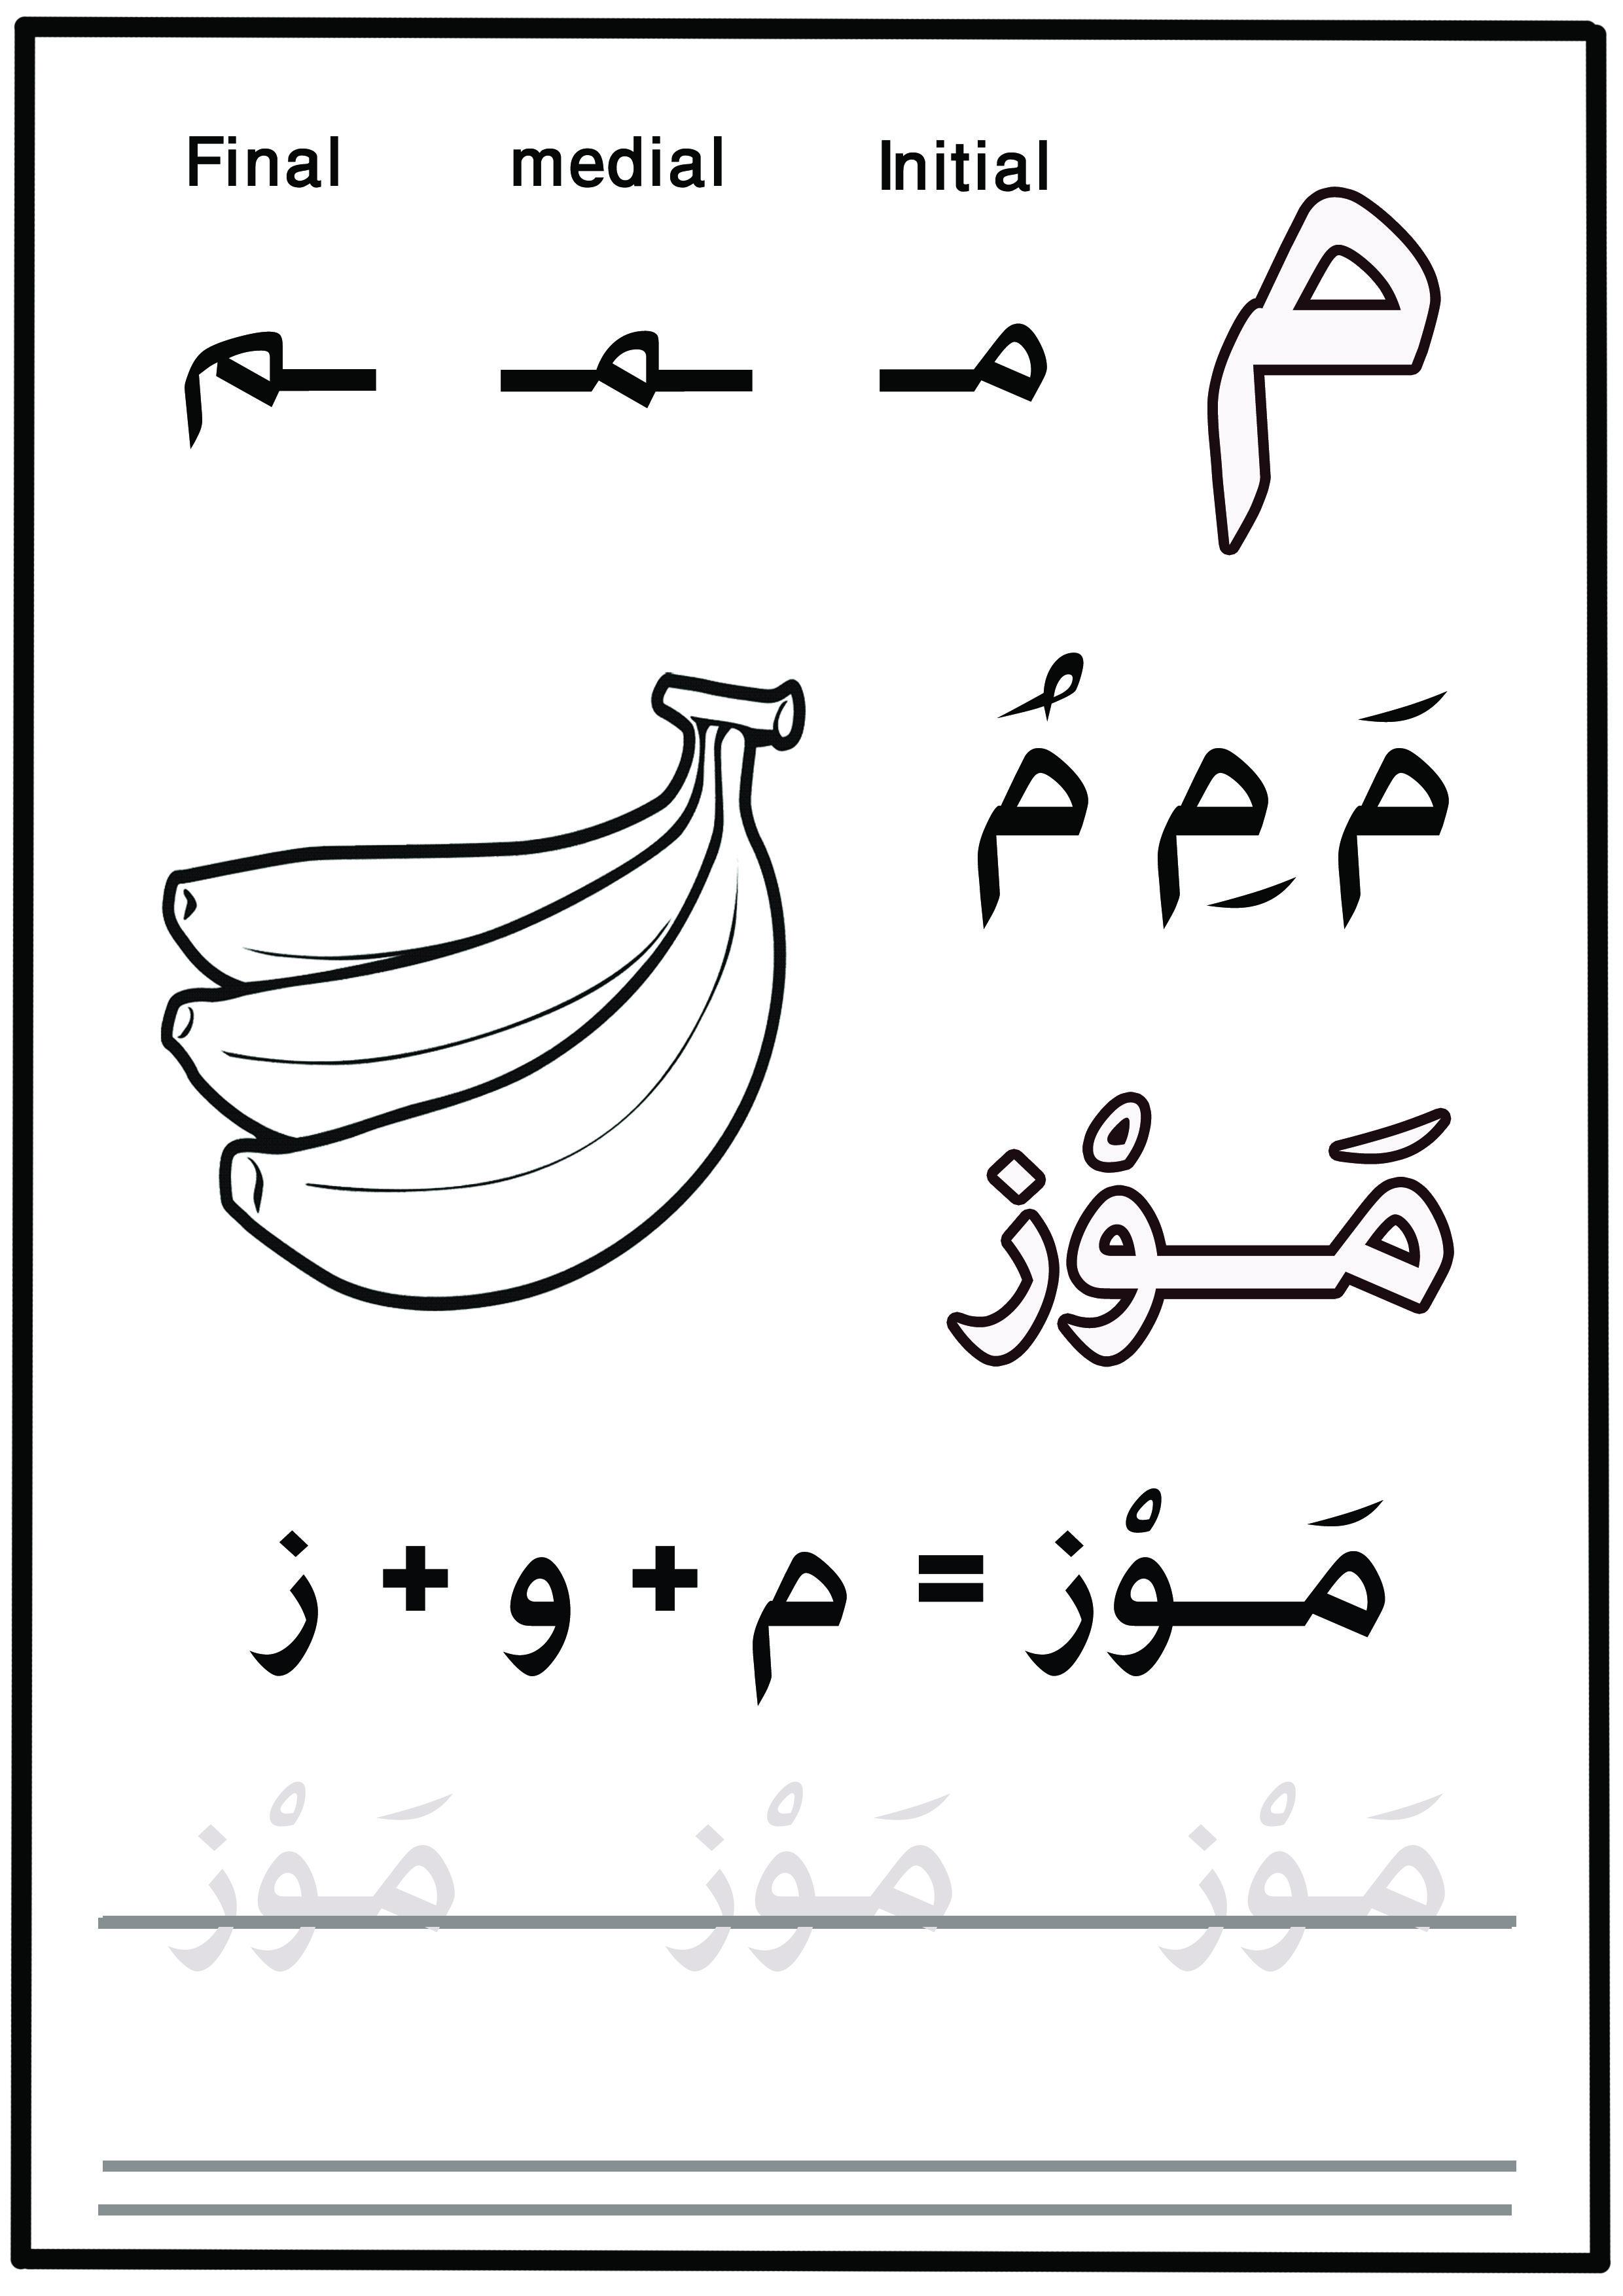 Alif Baa Taa Tsa For Kids Amr T Worksheets Learning